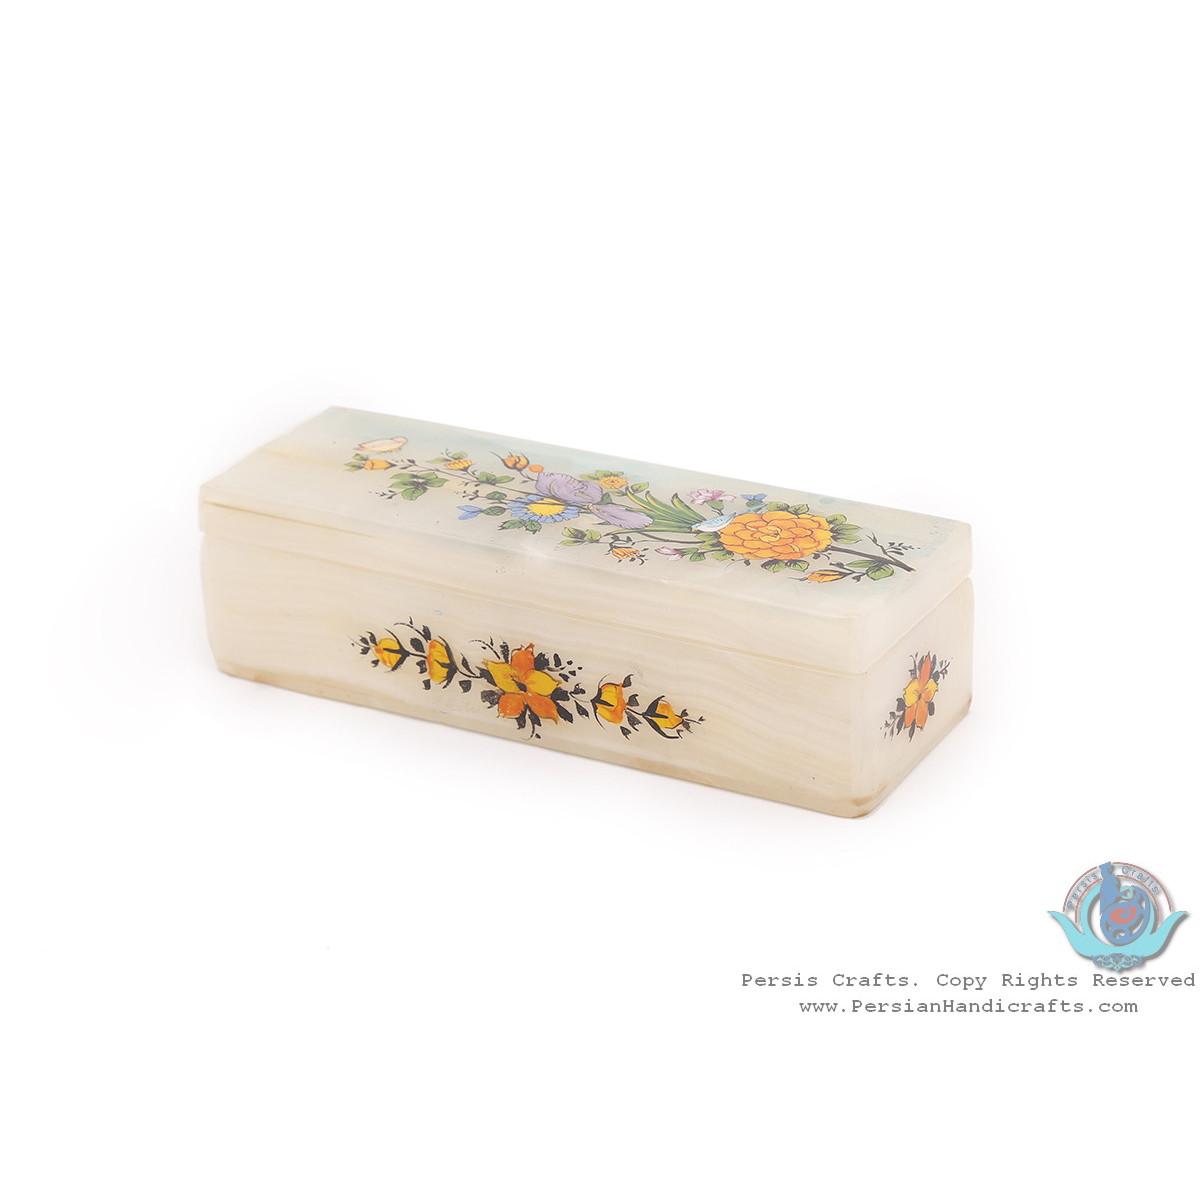 Flower & Bird Minature on Marble Stone Jewelry Box - HM3928-Persian Handicrafts